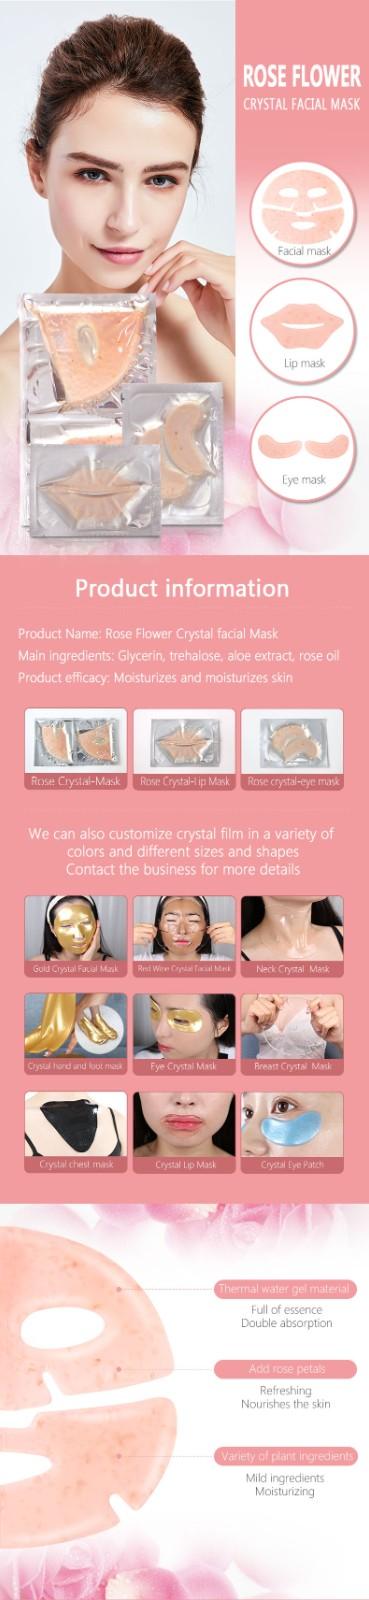 product-Lip Mask Lip padPink Whitening Gel Moisturizing Transparent Collagen Crystal Plumper-Calla-i